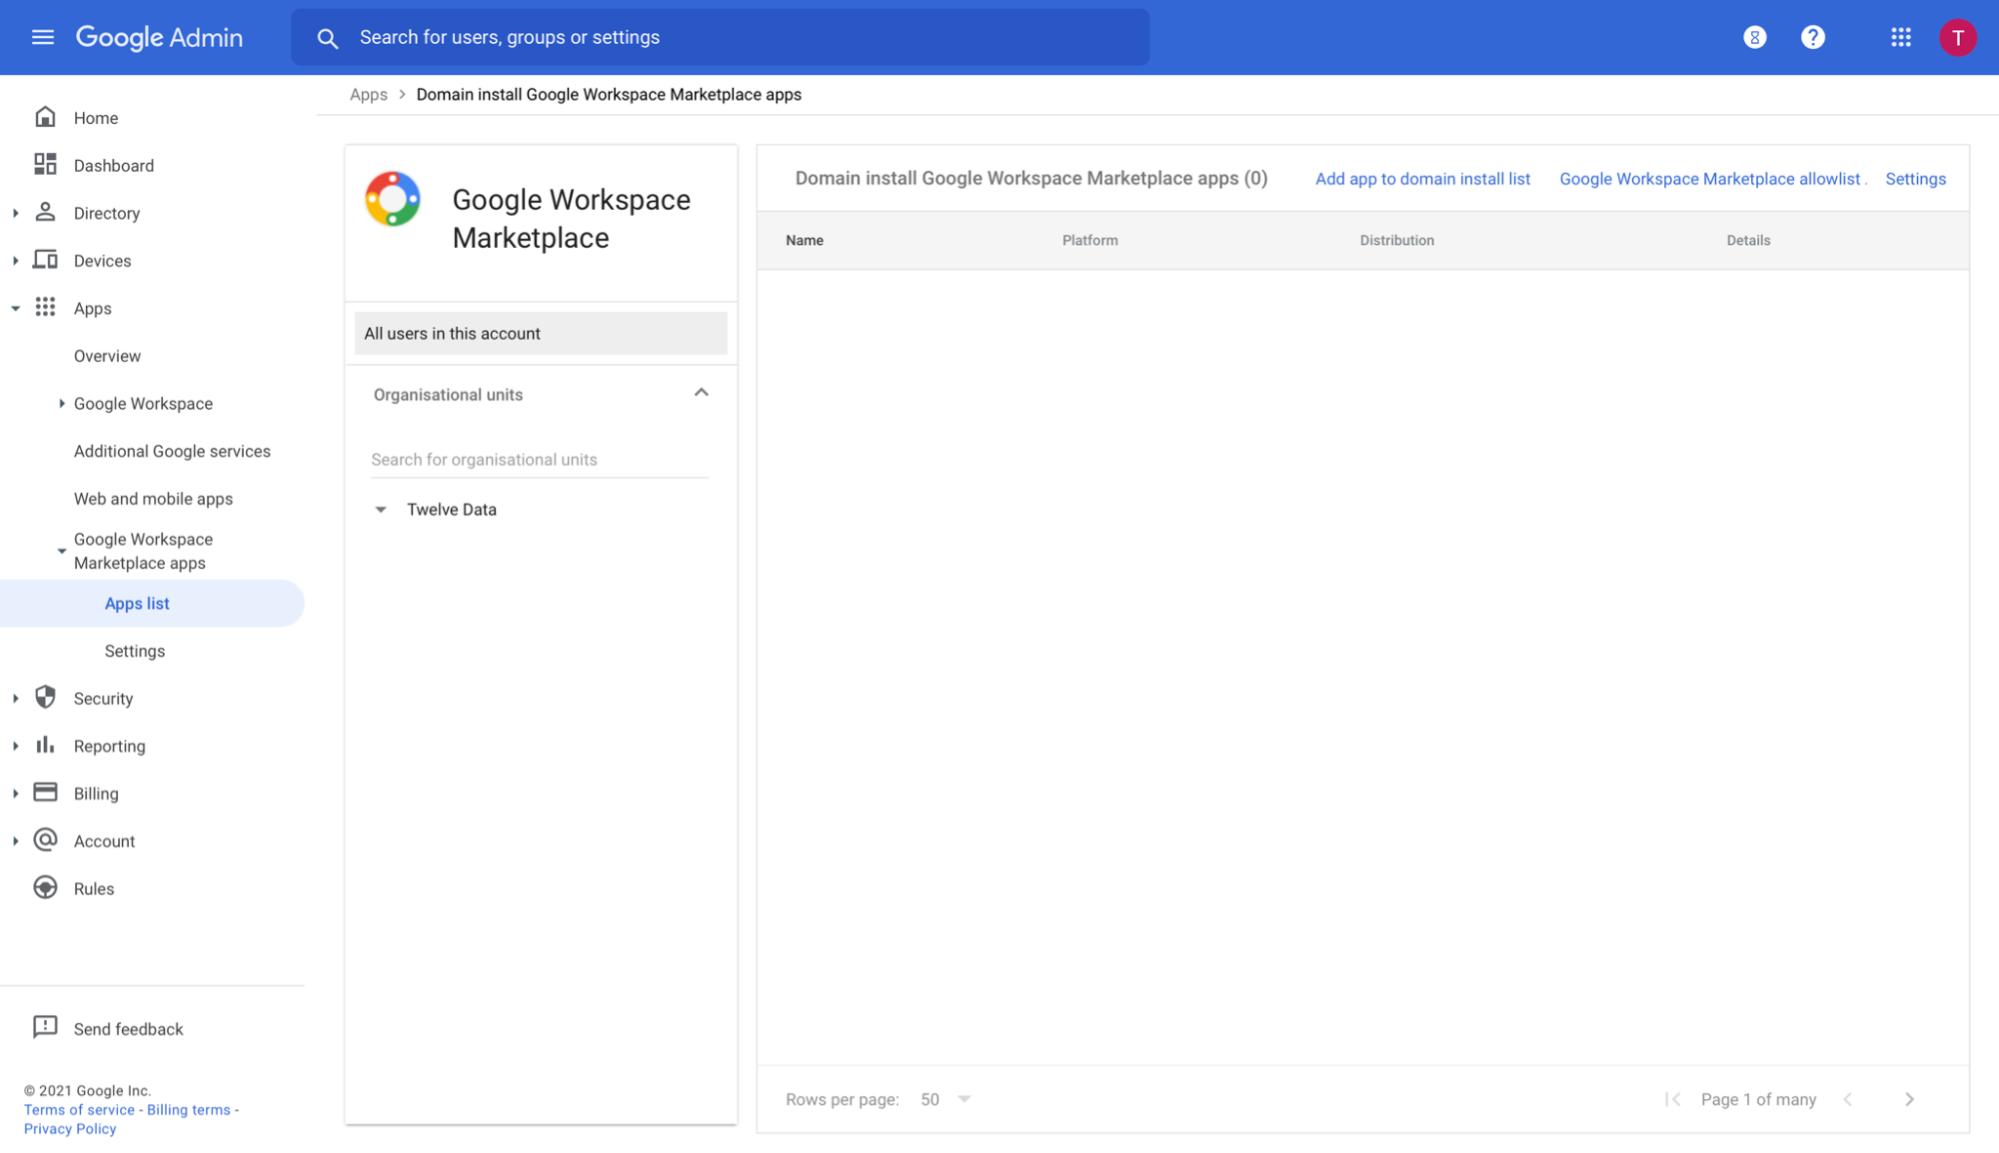 Google Admin Workspace app list